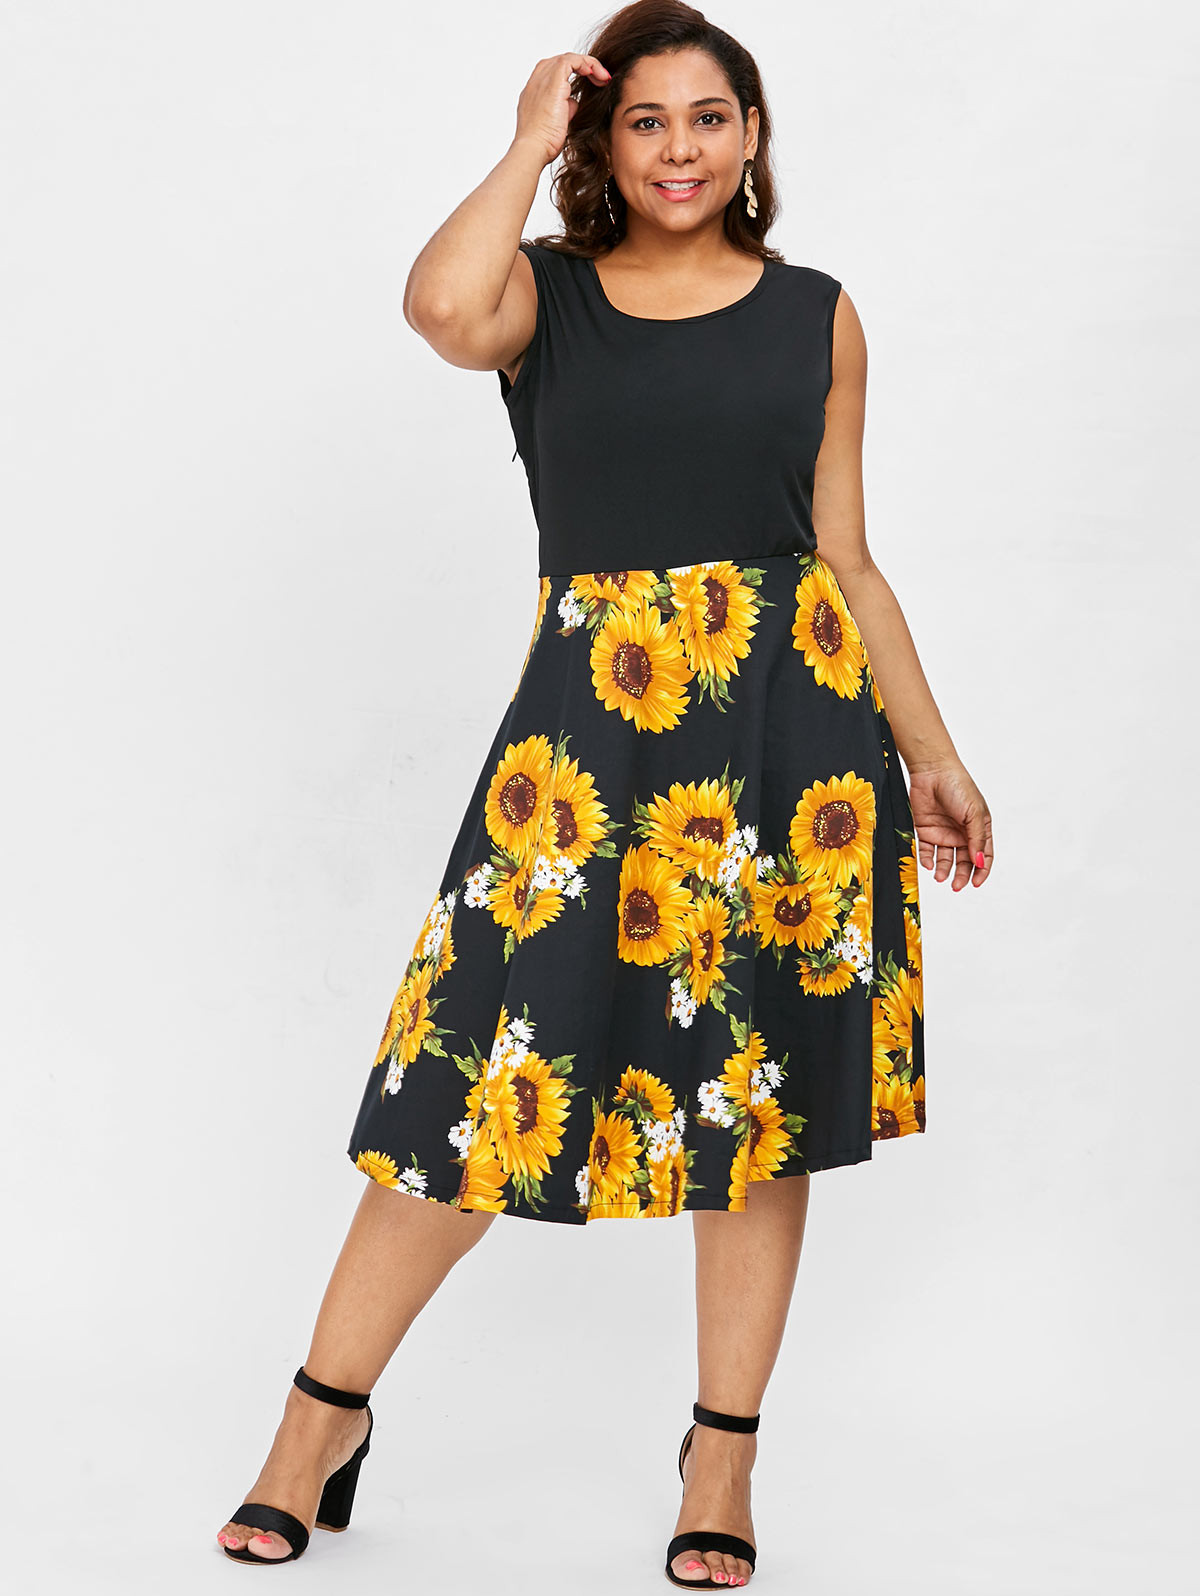 Dresses Length  Knee-Length Neckline  Round Collar Sleeve Length   Sleeveless Pattern Type  Print With Belt  No Season  Spring 0ca59ba7ac8d